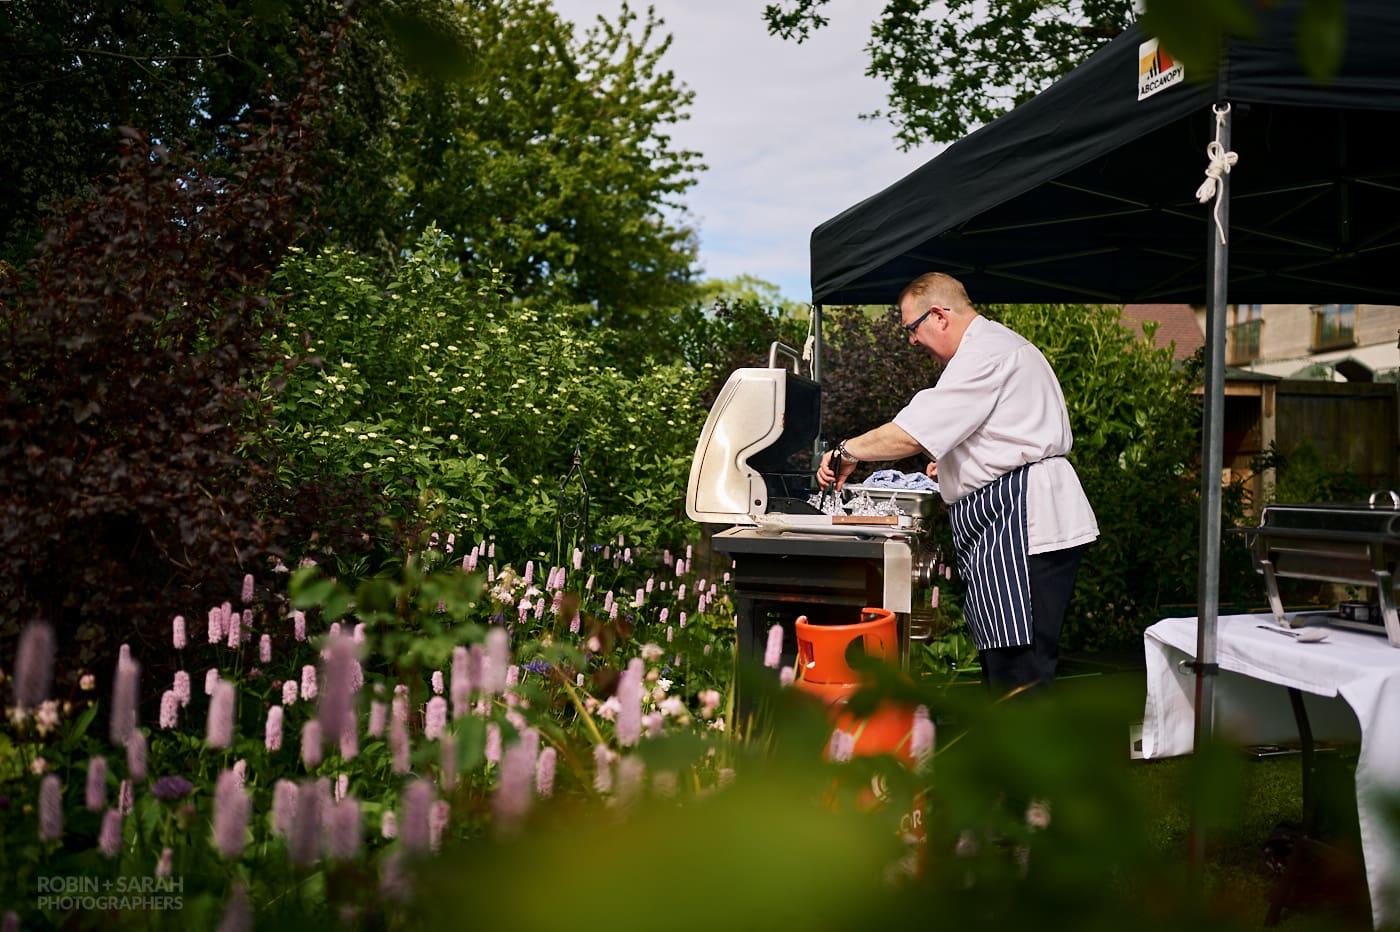 Chef prepares food at small garden wedding